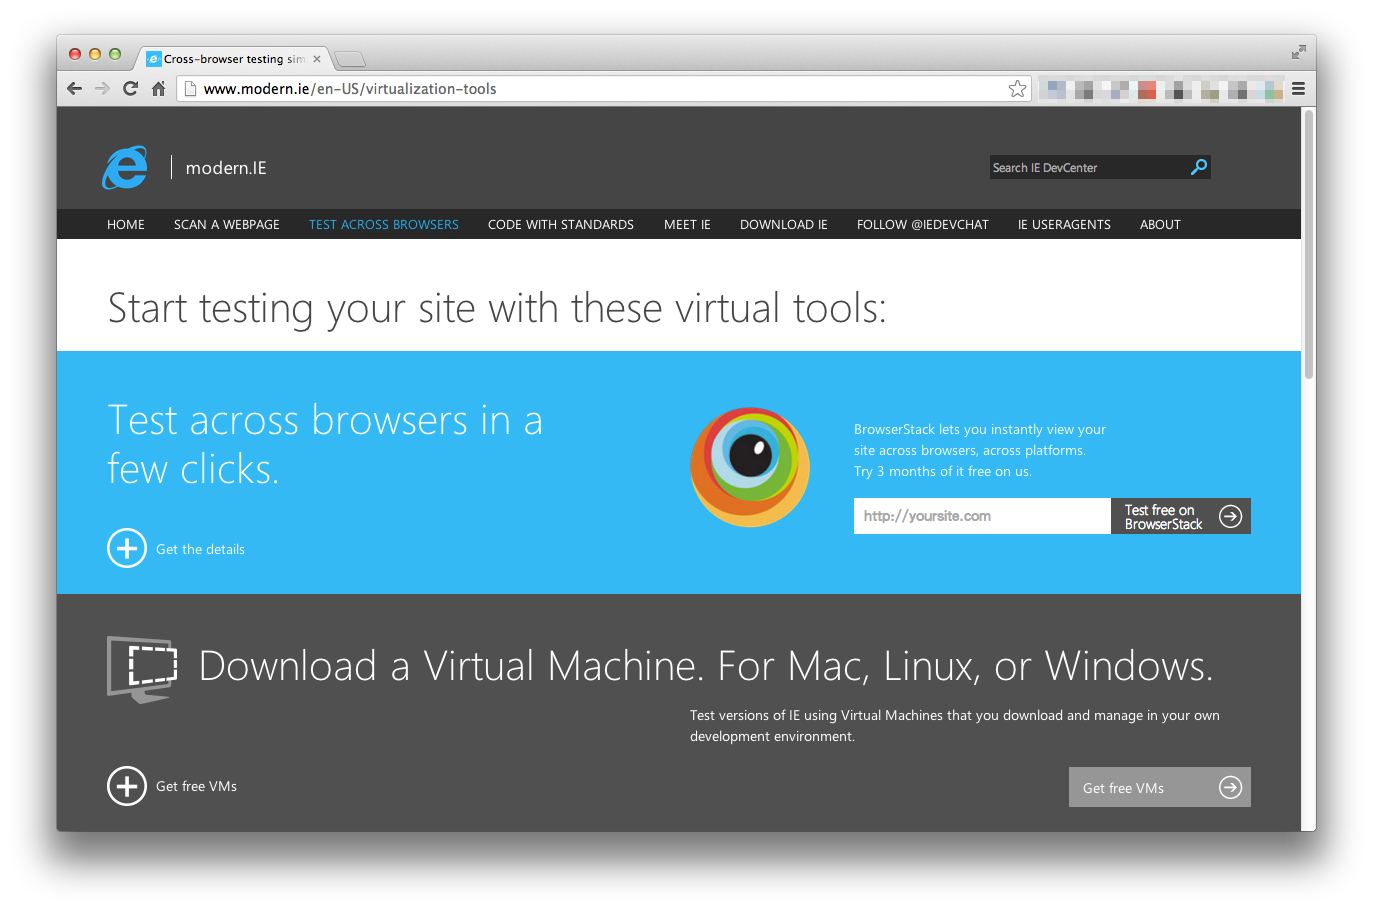 Cross-browser-testing